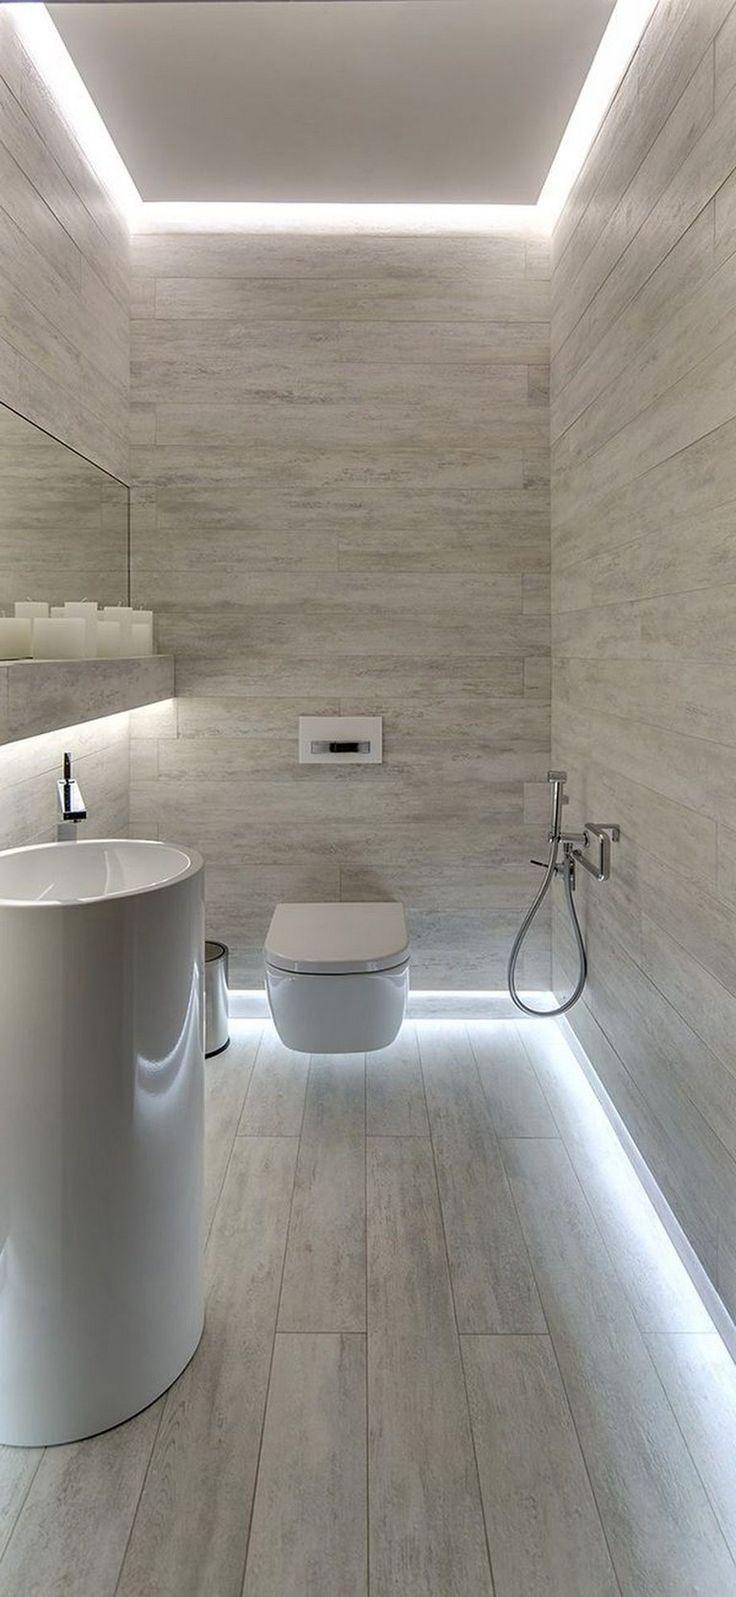 63 Awesome Modern Led Strip Ceiling Light Design Page 48 Of 64 Modern Bathroom Design Modern Bathroom Bathroom Ceiling Light